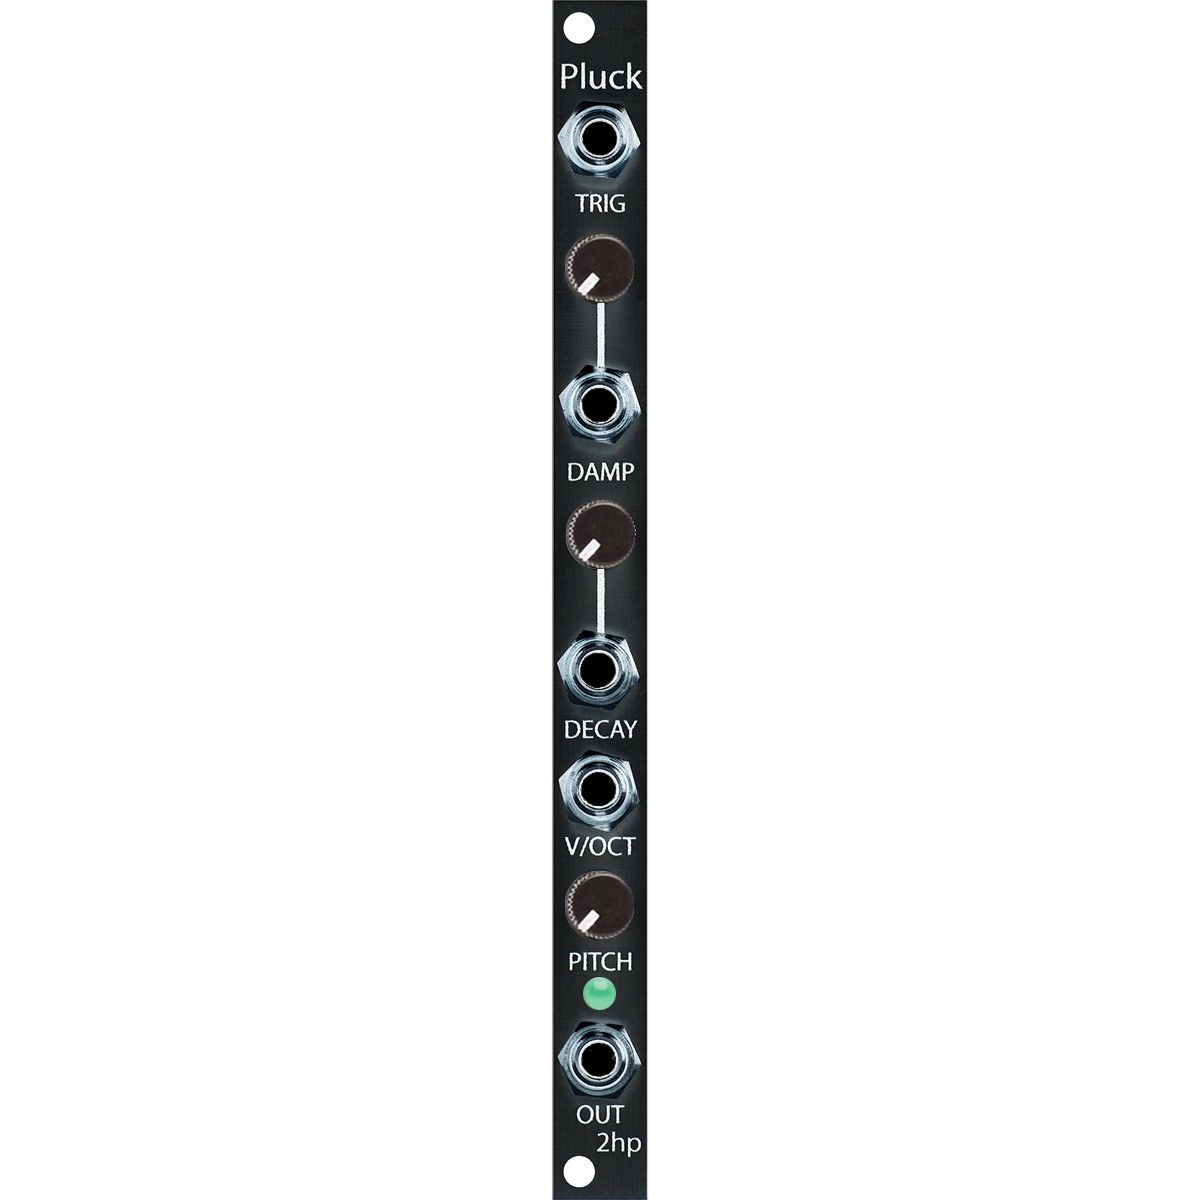 2hp Pluck Eurorack Karplus-Strong Oscillator Module (Black)